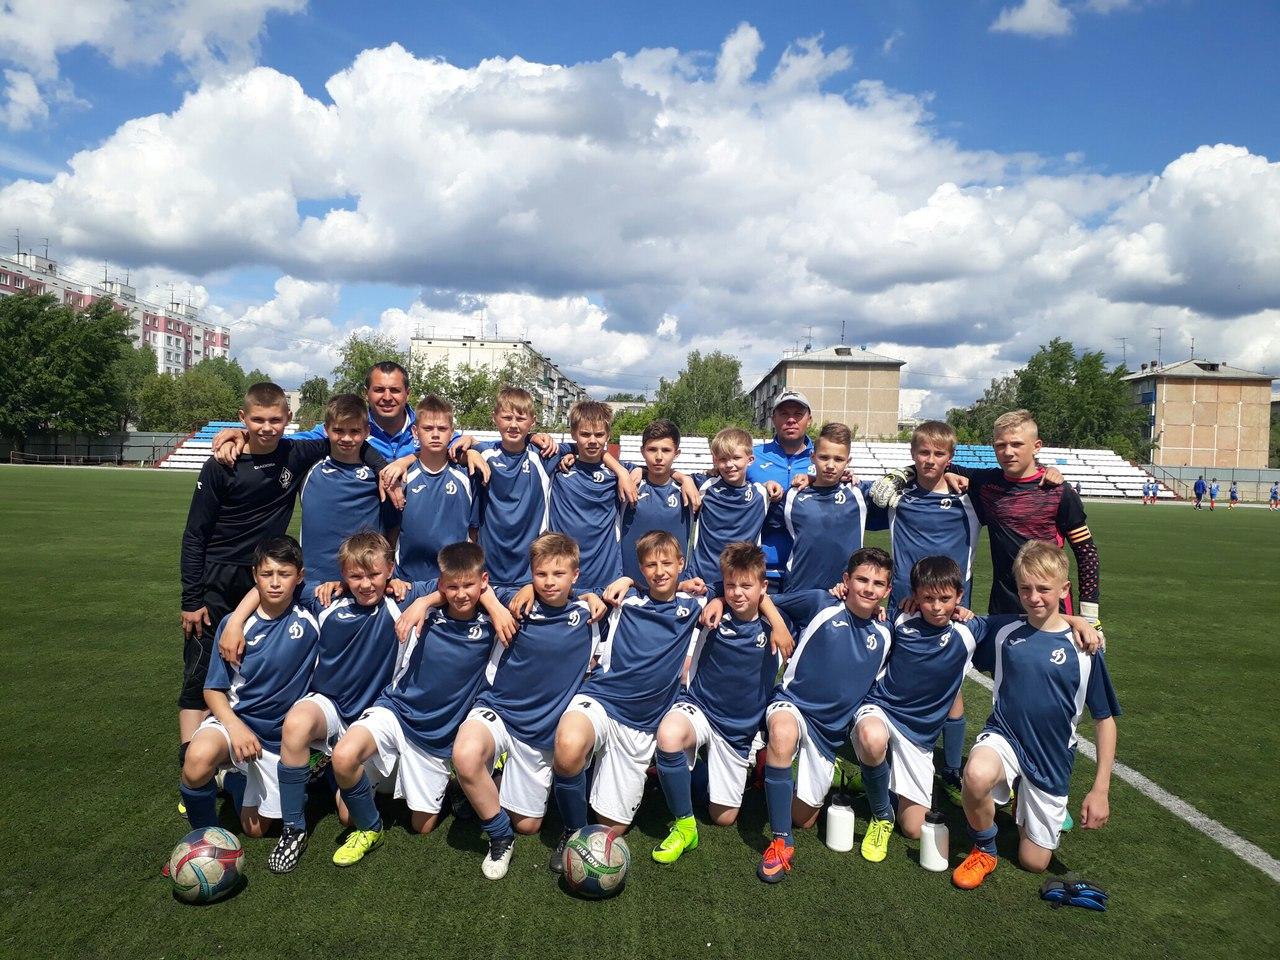 «Динамо-2004» обыграло «Иртыш-2004» (21.09.2018)